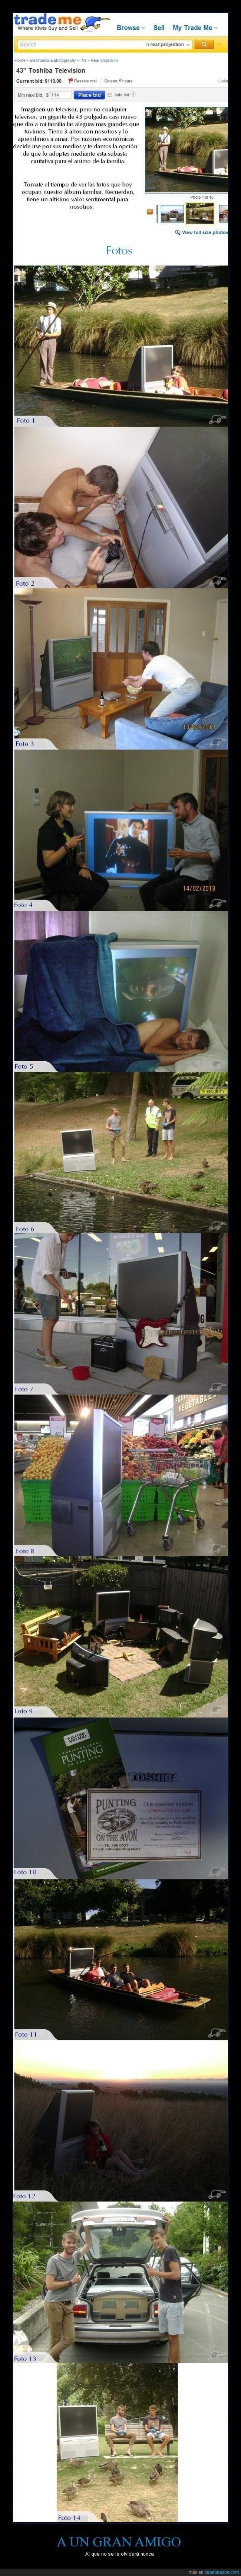 vender la tele